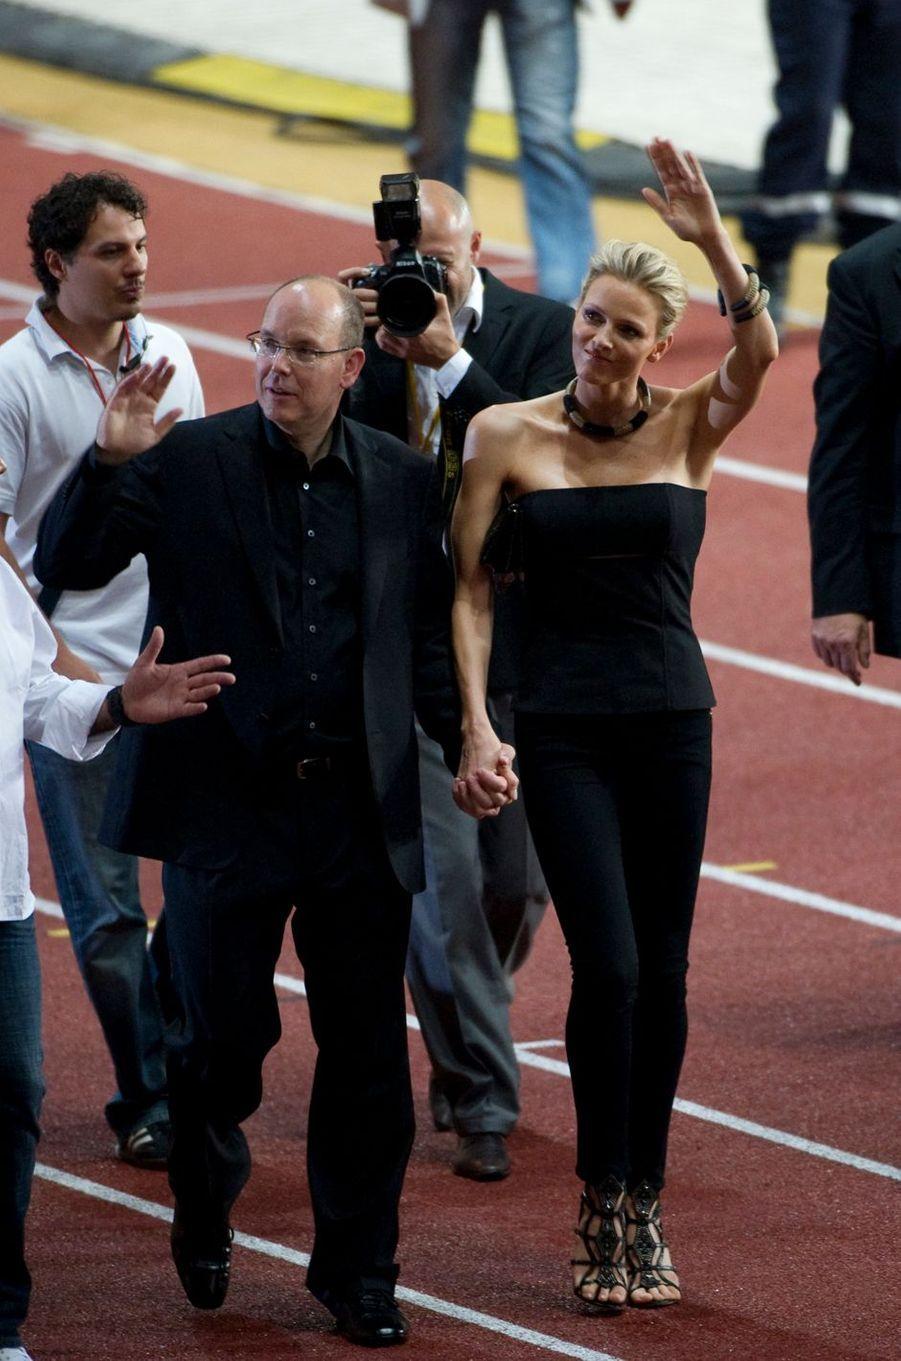 Charlène Wittstock, en total look black, et le prince Albert II de Monaco au stade Louis-II à Monaco, le 30 juin 2011